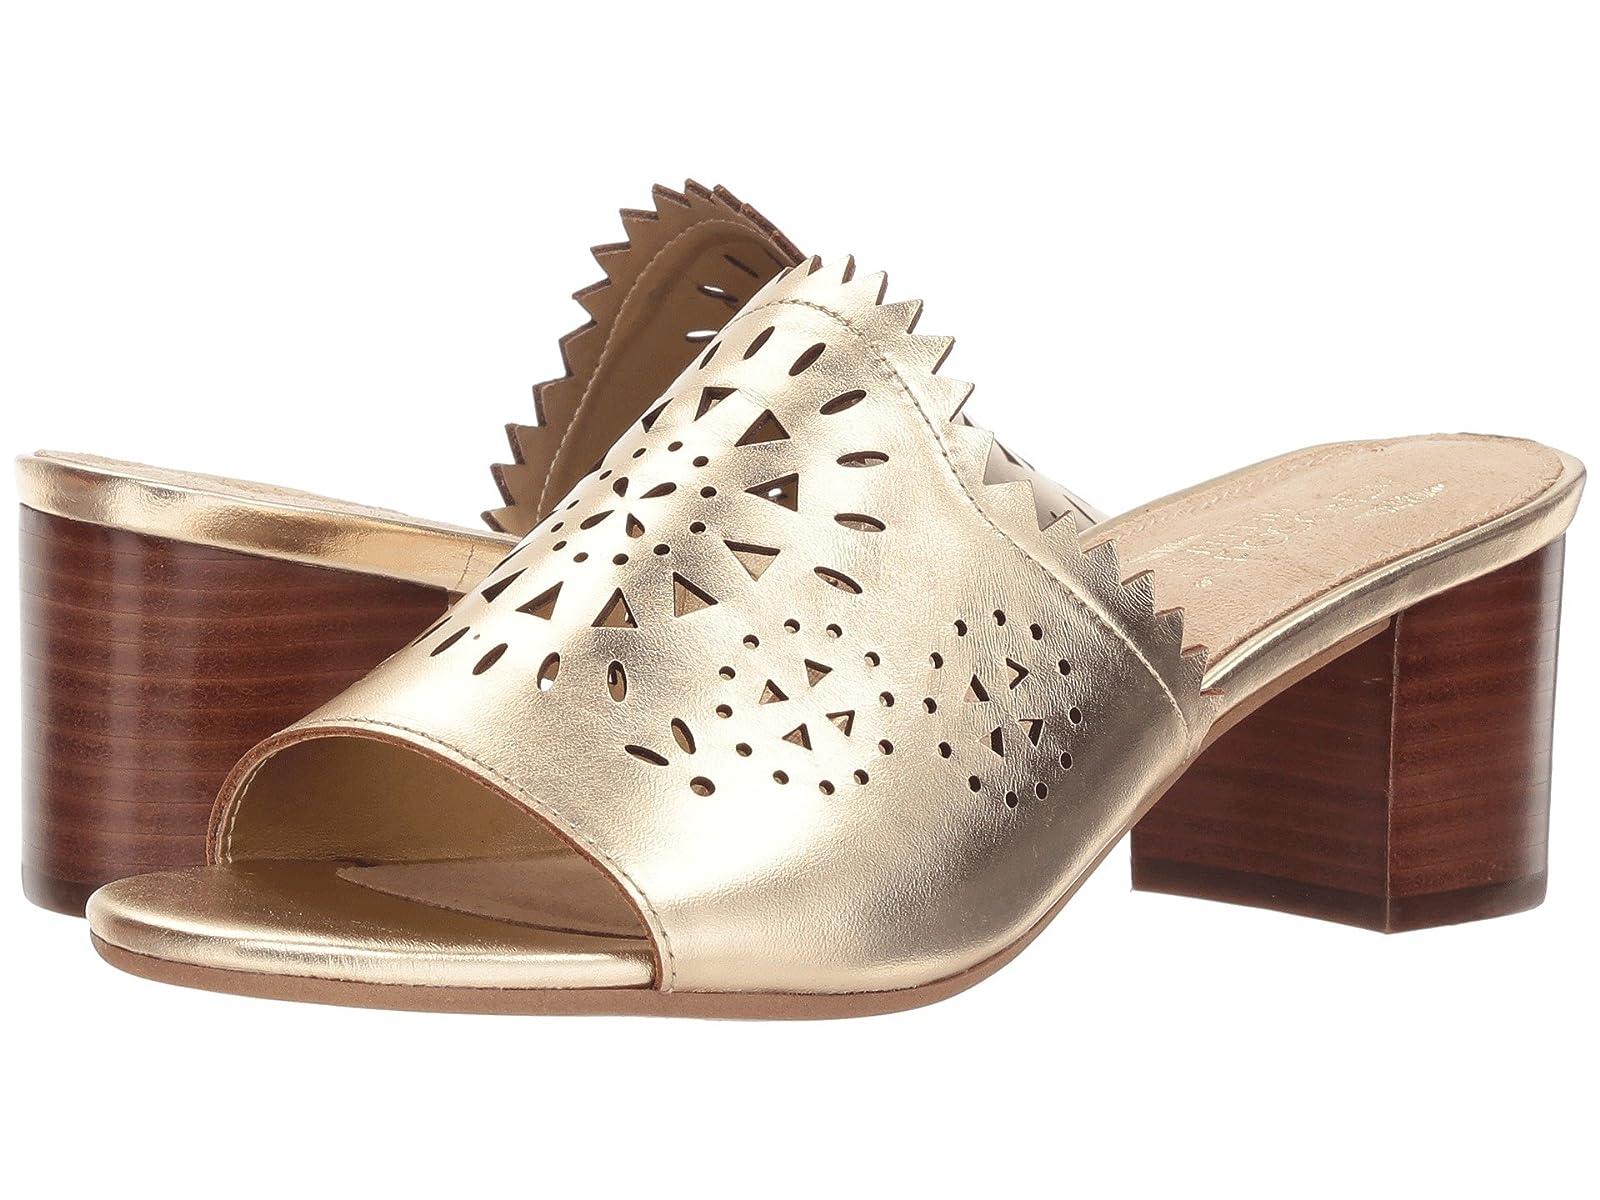 Aerosoles MidsummerAtmospheric grades have affordable shoes